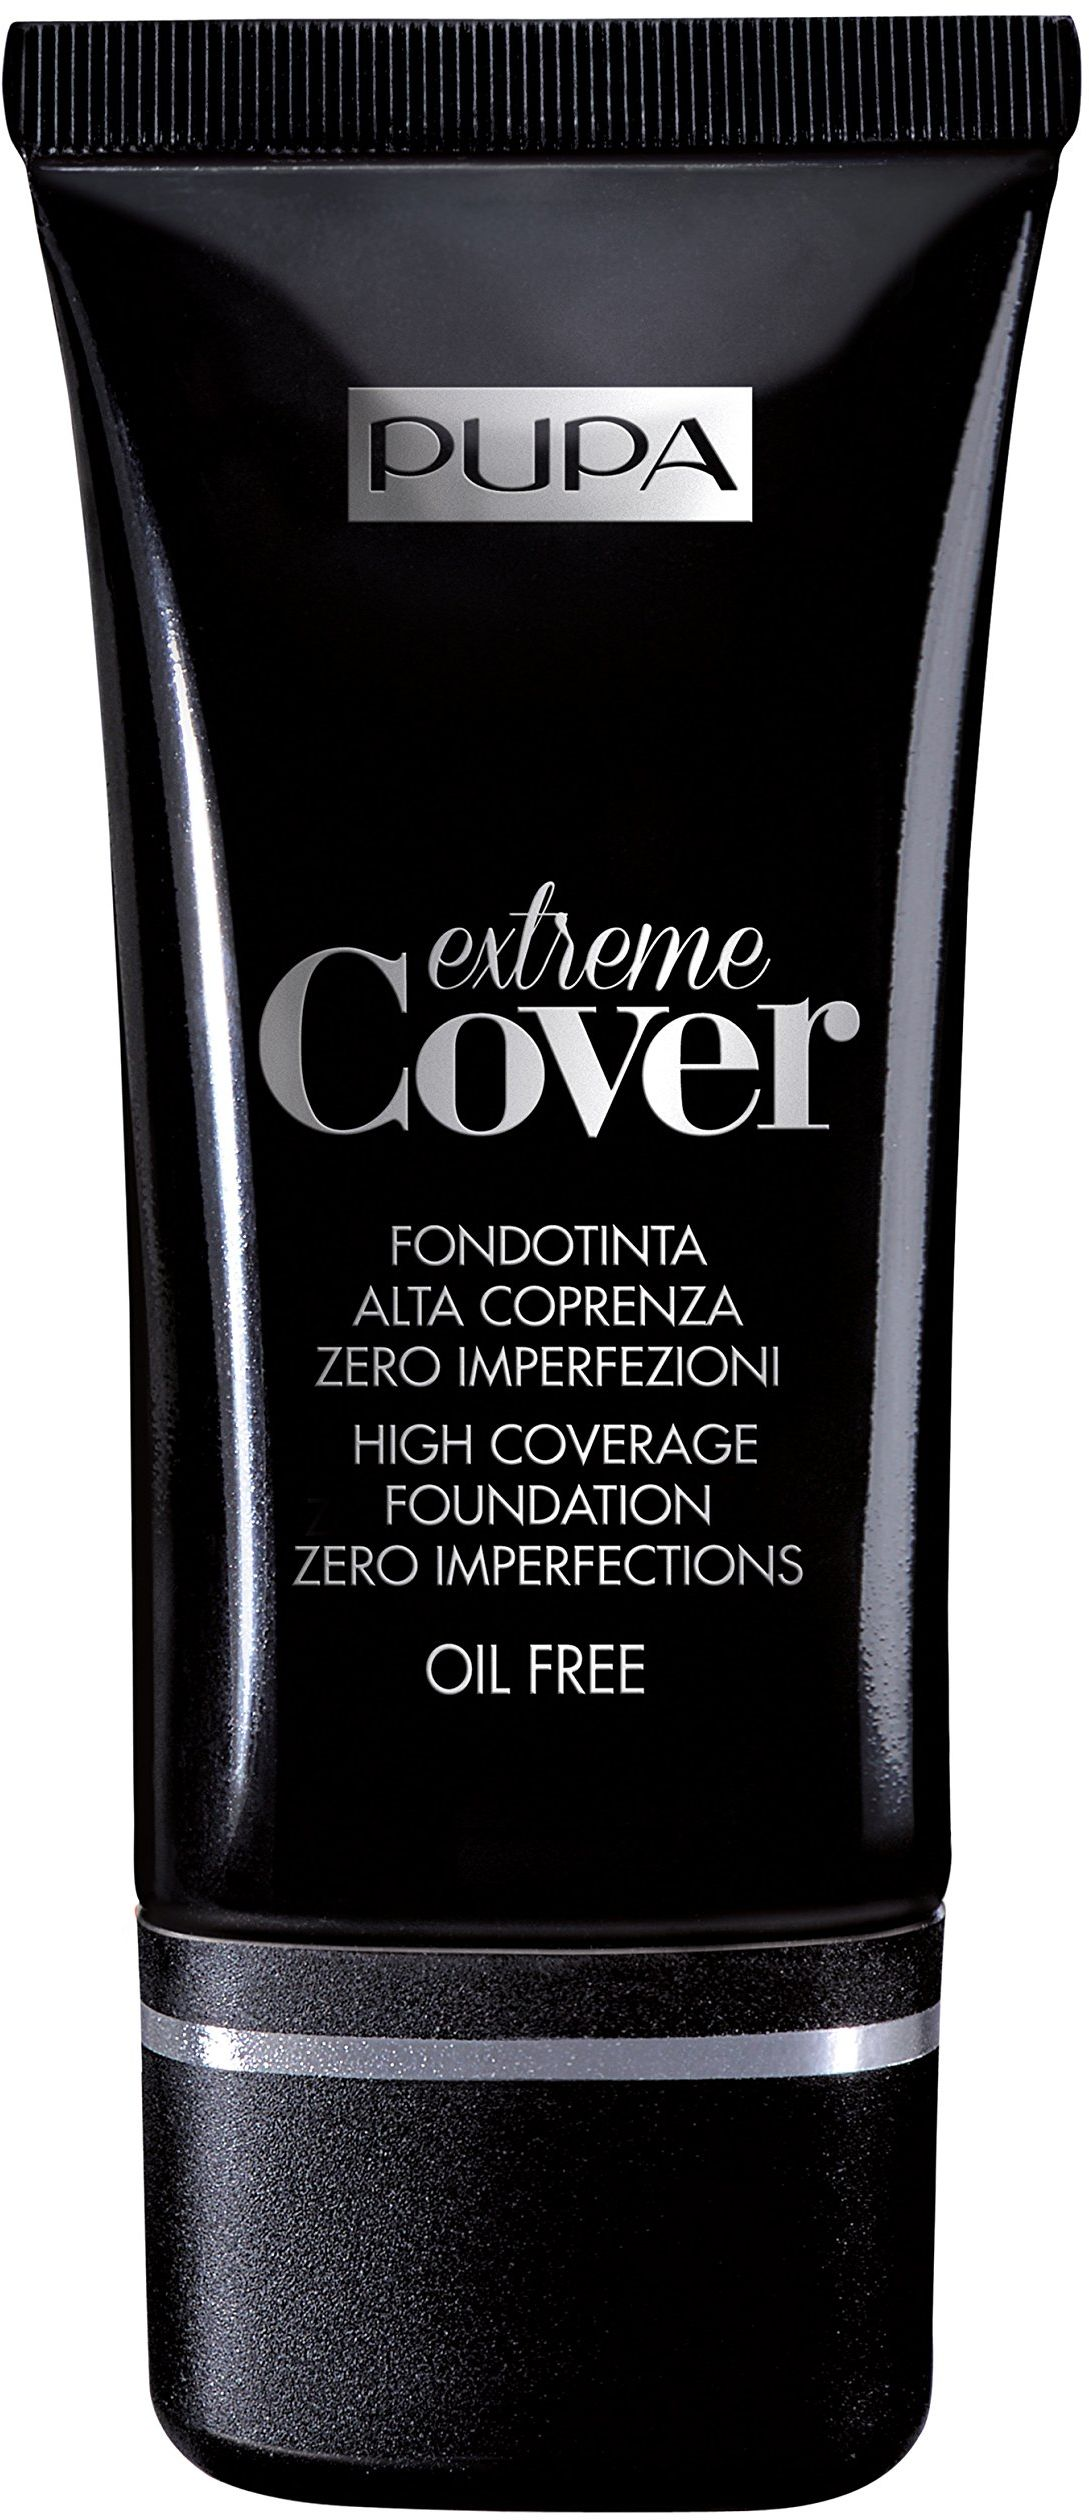 Pupa Extreme Cover Fondotinta, N. 020 Fair Beige